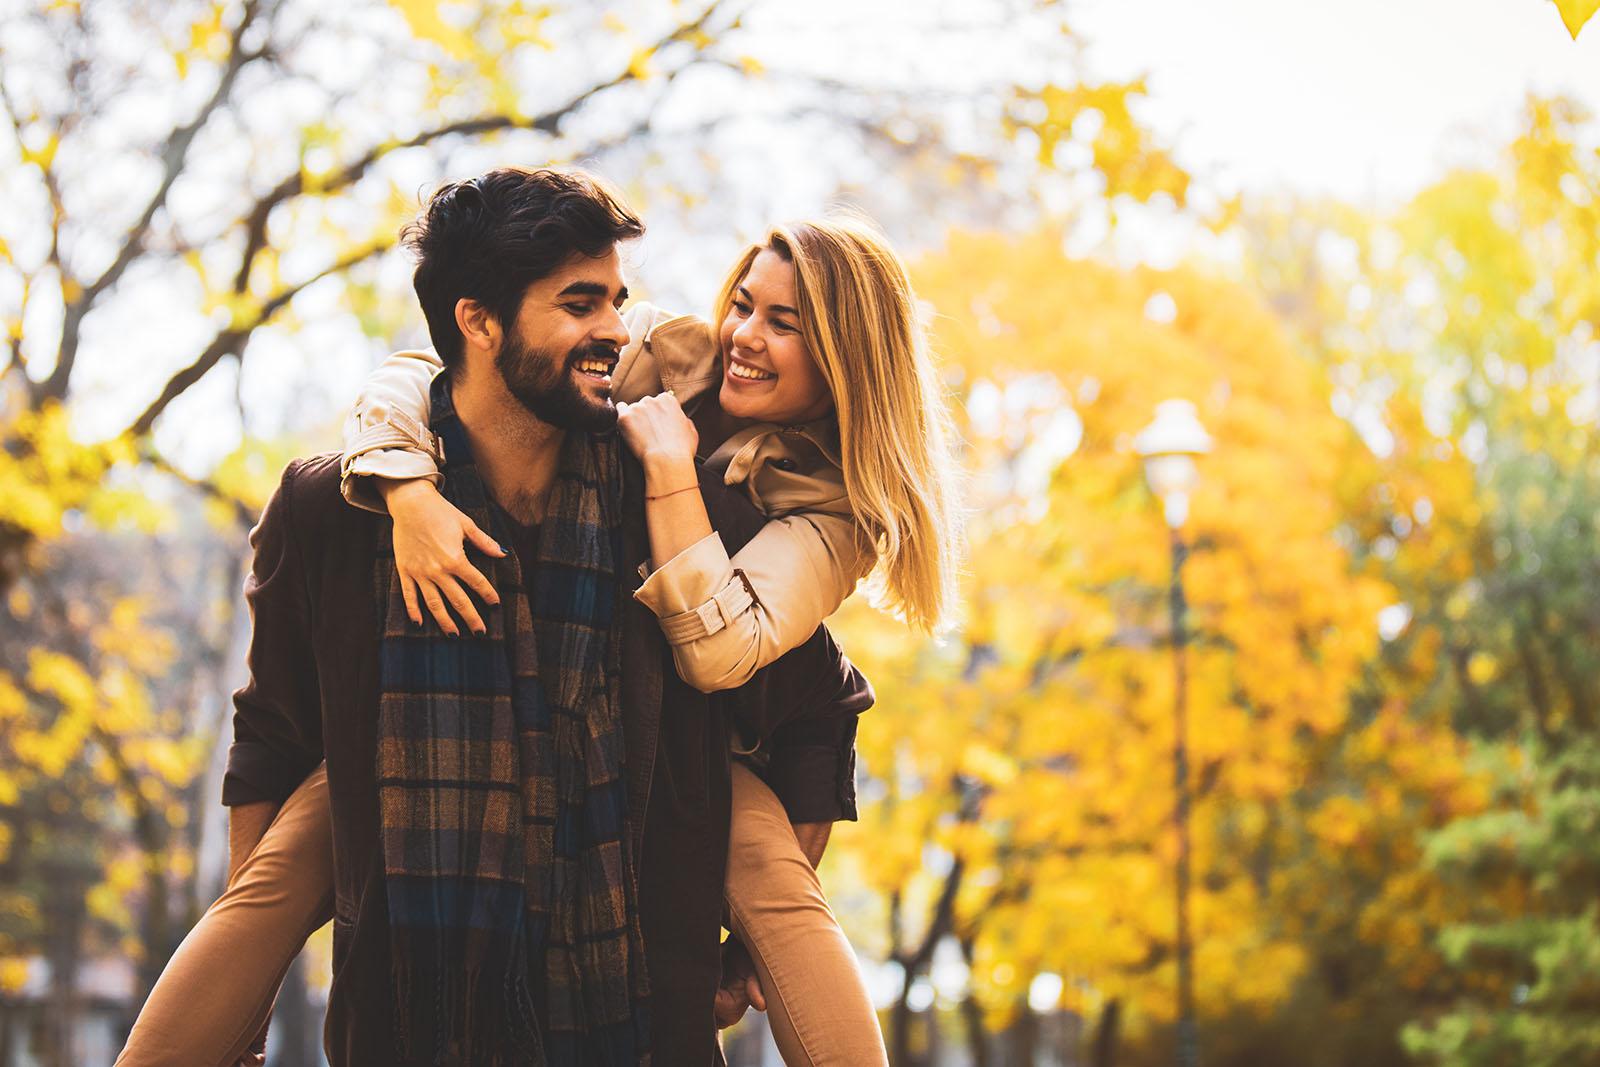 happy-couple-with-trees